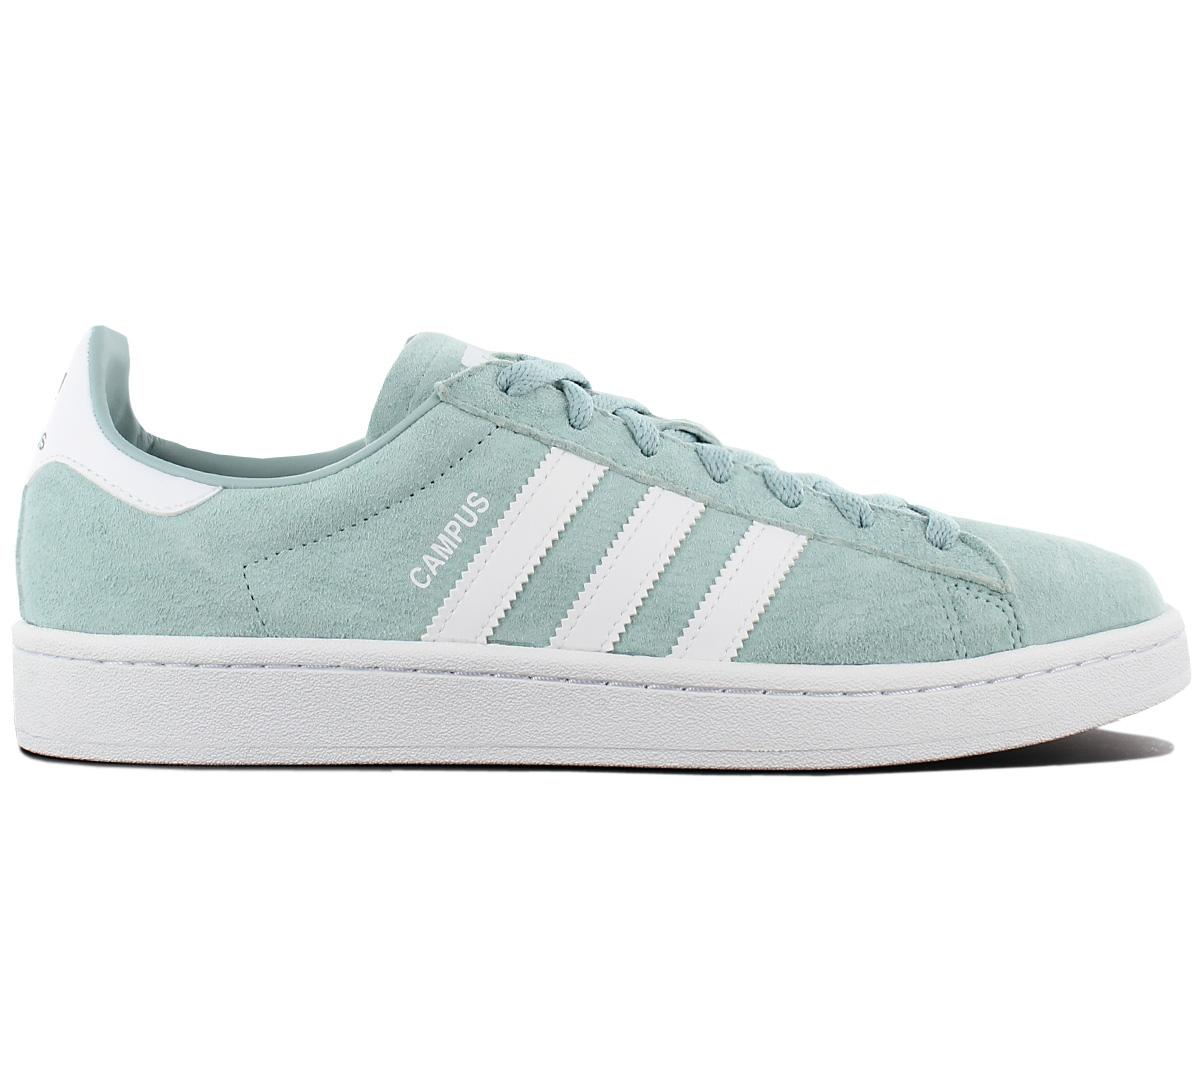 Adidas Originals Campus Leder Sneaker Schuhe Retro Turnschuhe Leder Sportschuh Sportschuh Leder 3558d4